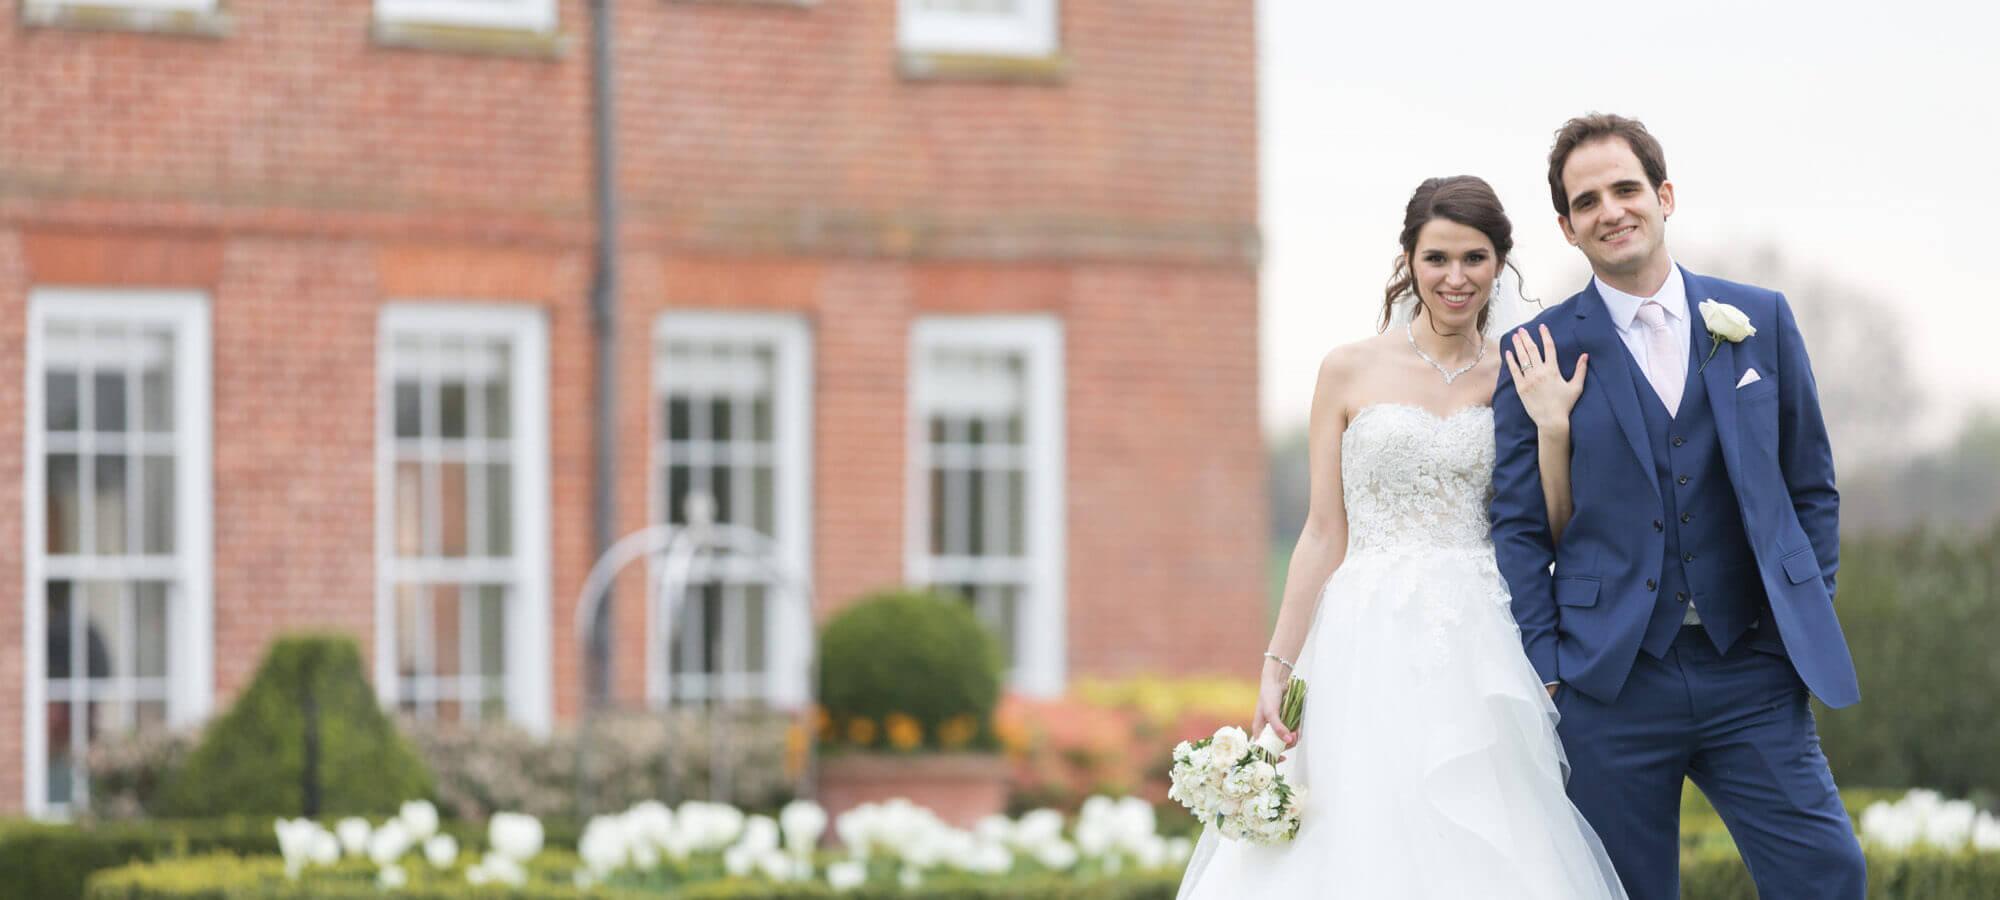 11 four seasons hampshire weddingphotography alt copy